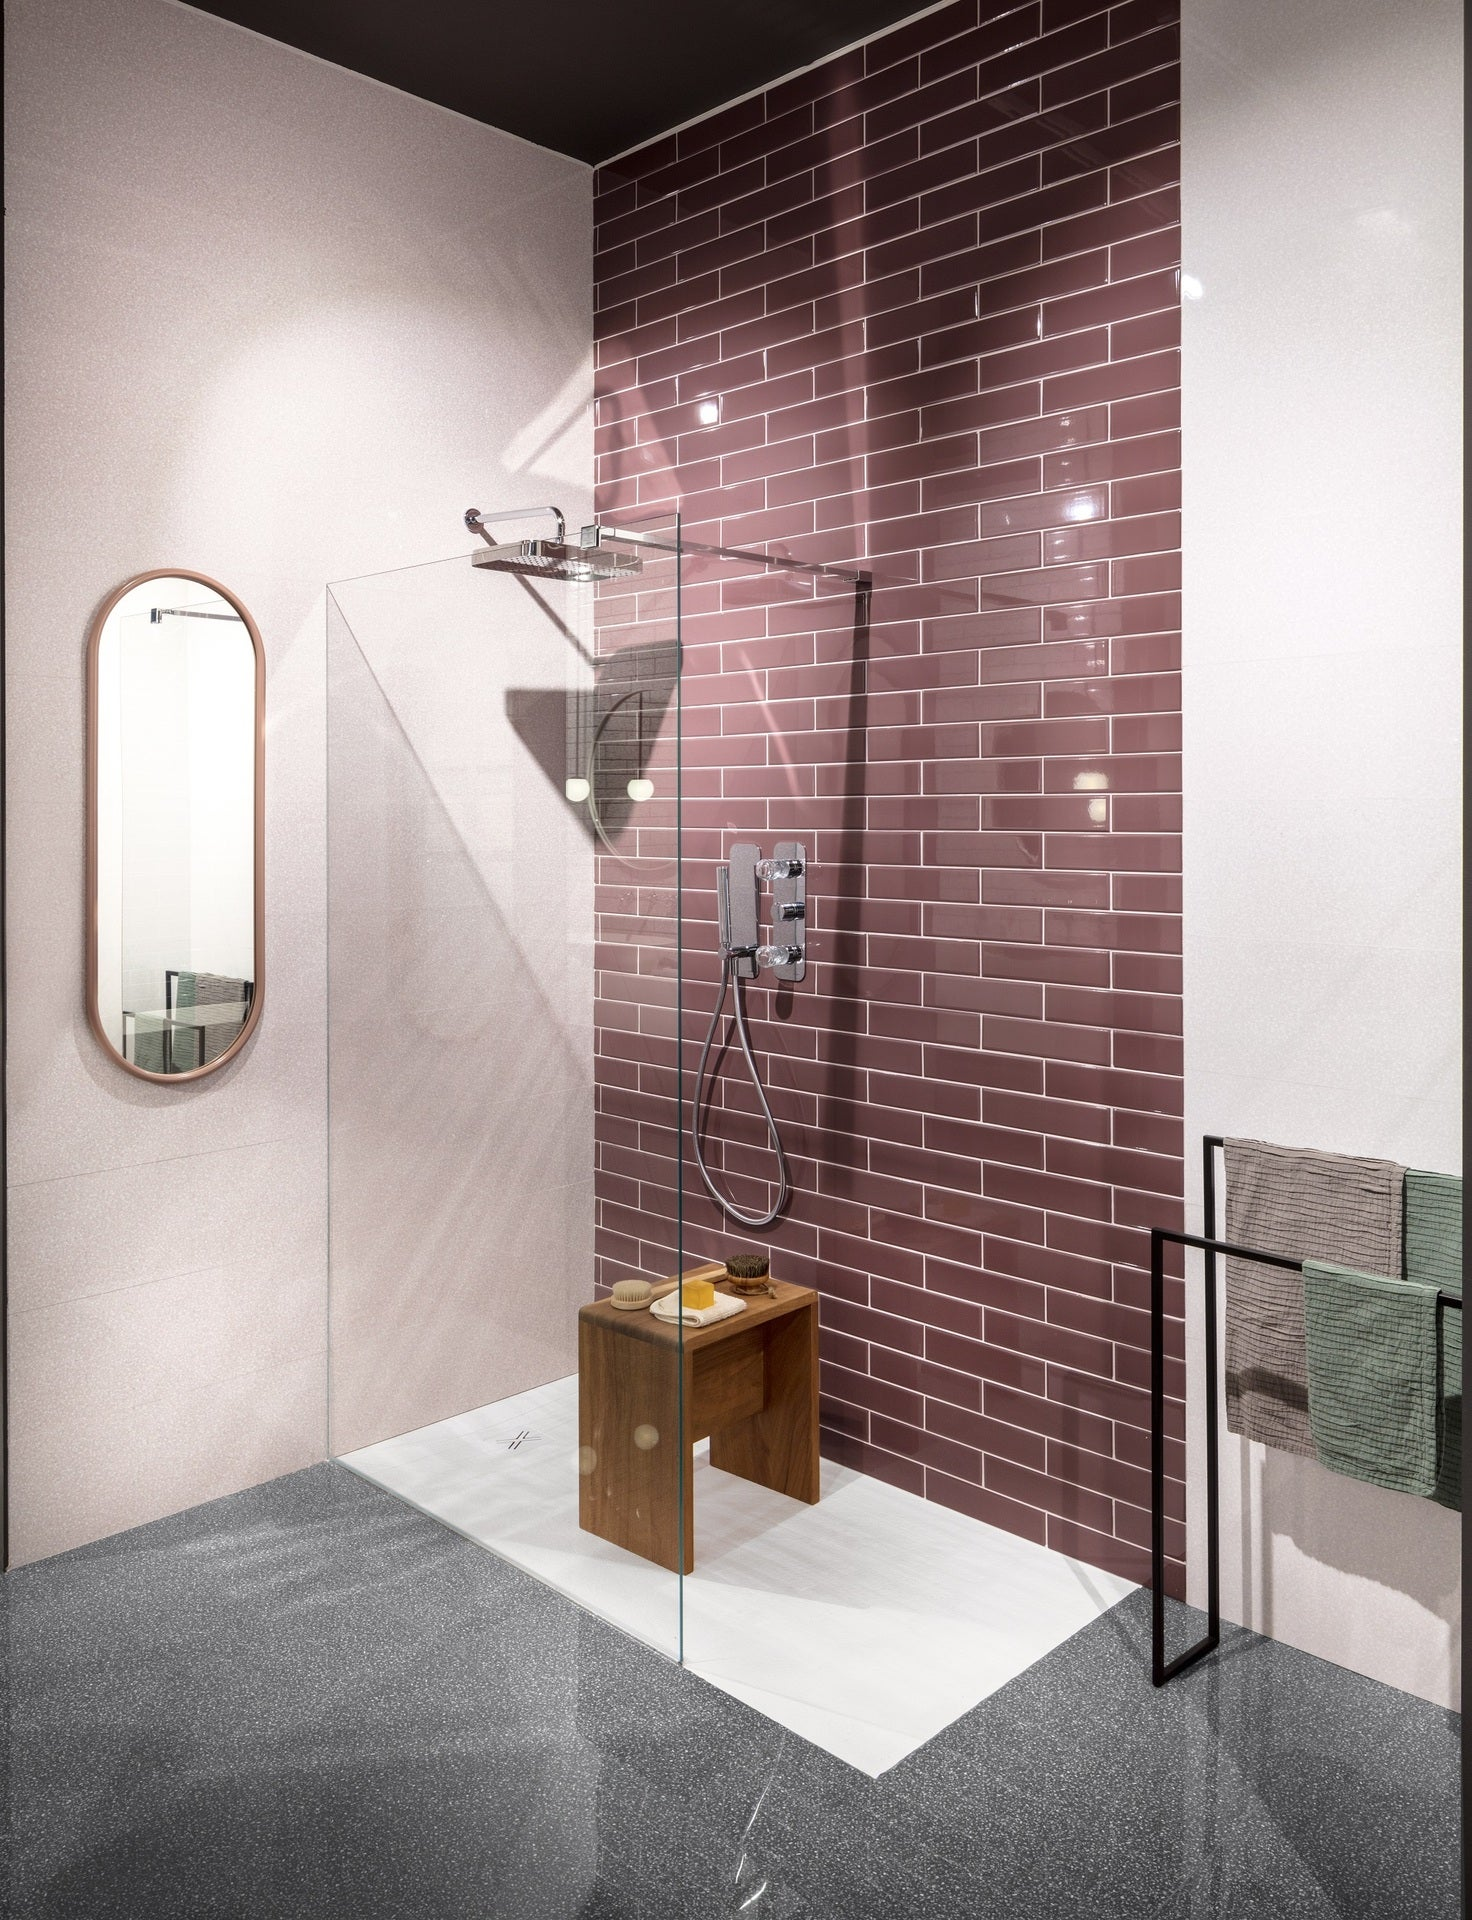 carrelage mur marbre rose poli l 25 x l 75 cm newdot sant agostino leroy merlin